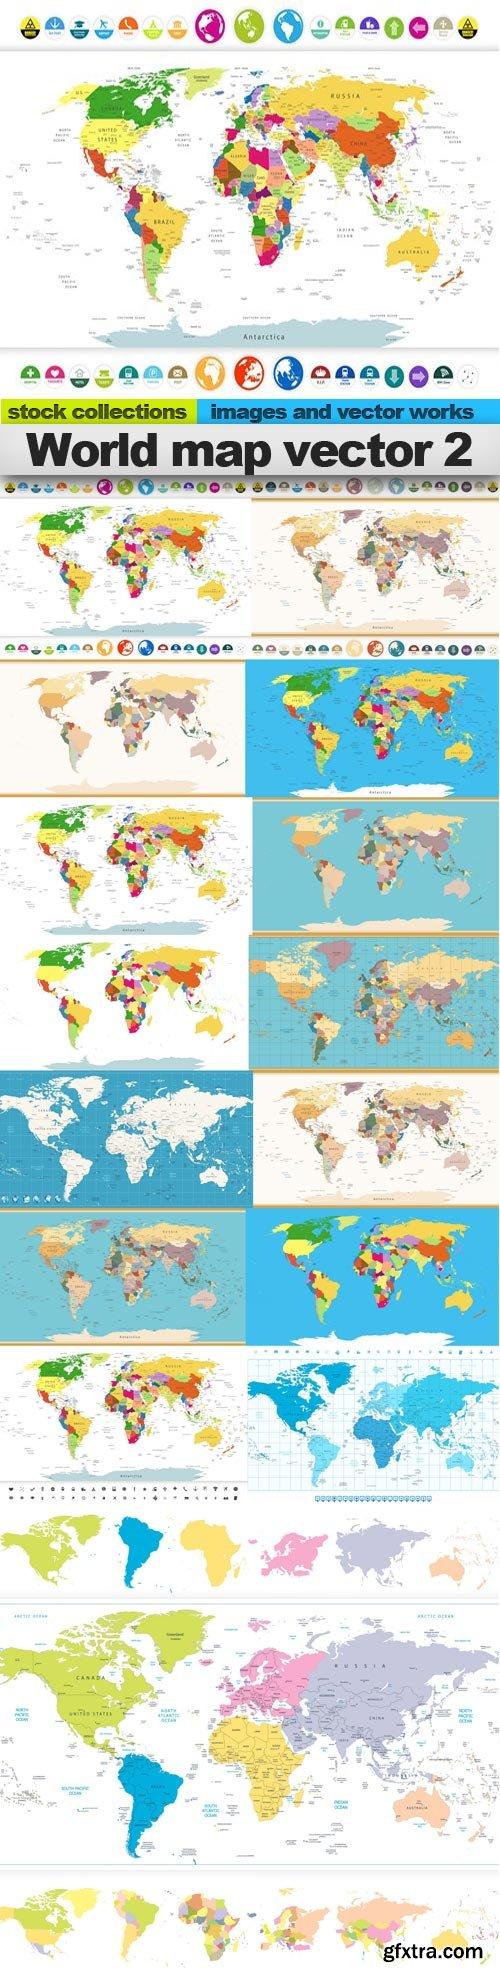 World map vector 2, 15 x EPS